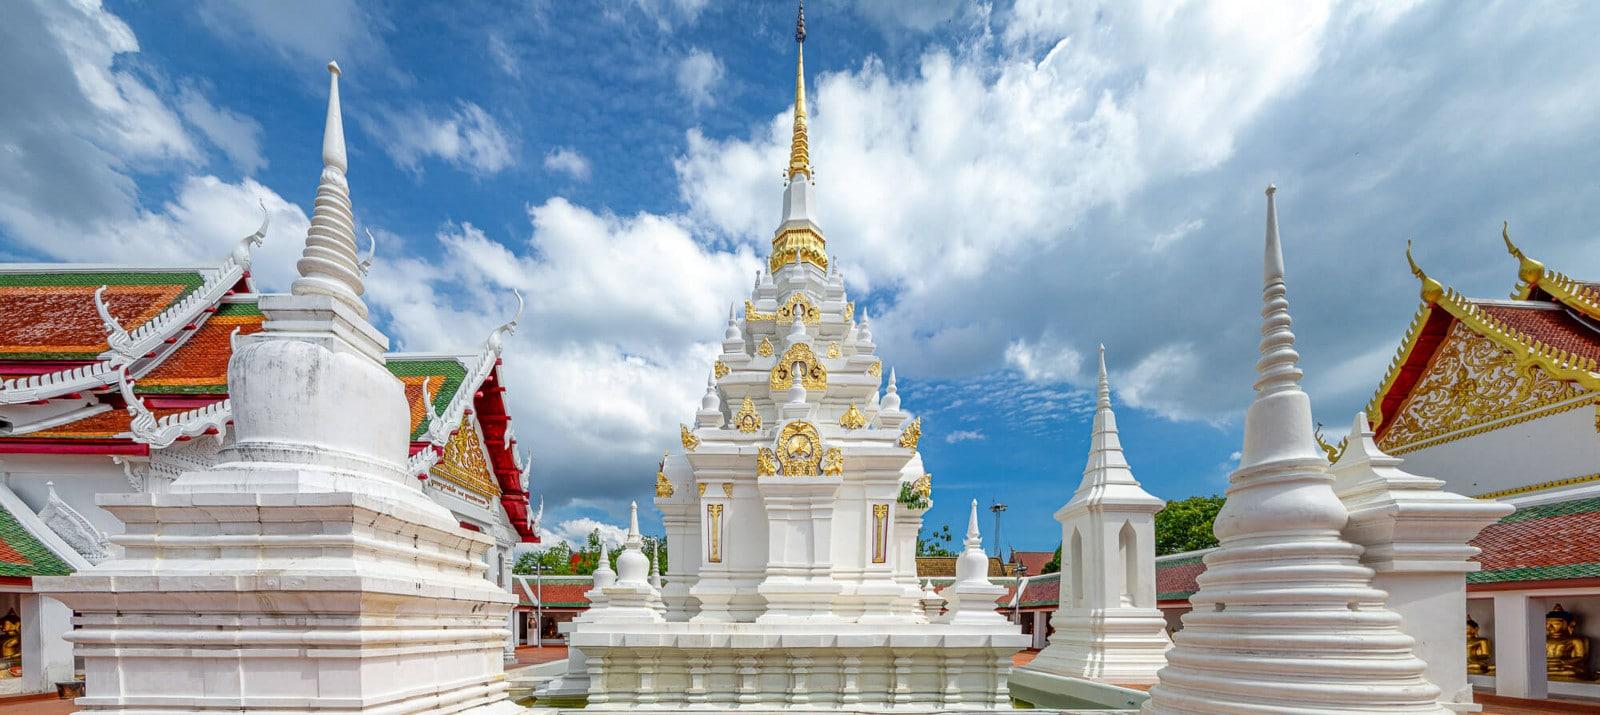 Wat Phra Boromthat Chaiya Ratchaworawihan